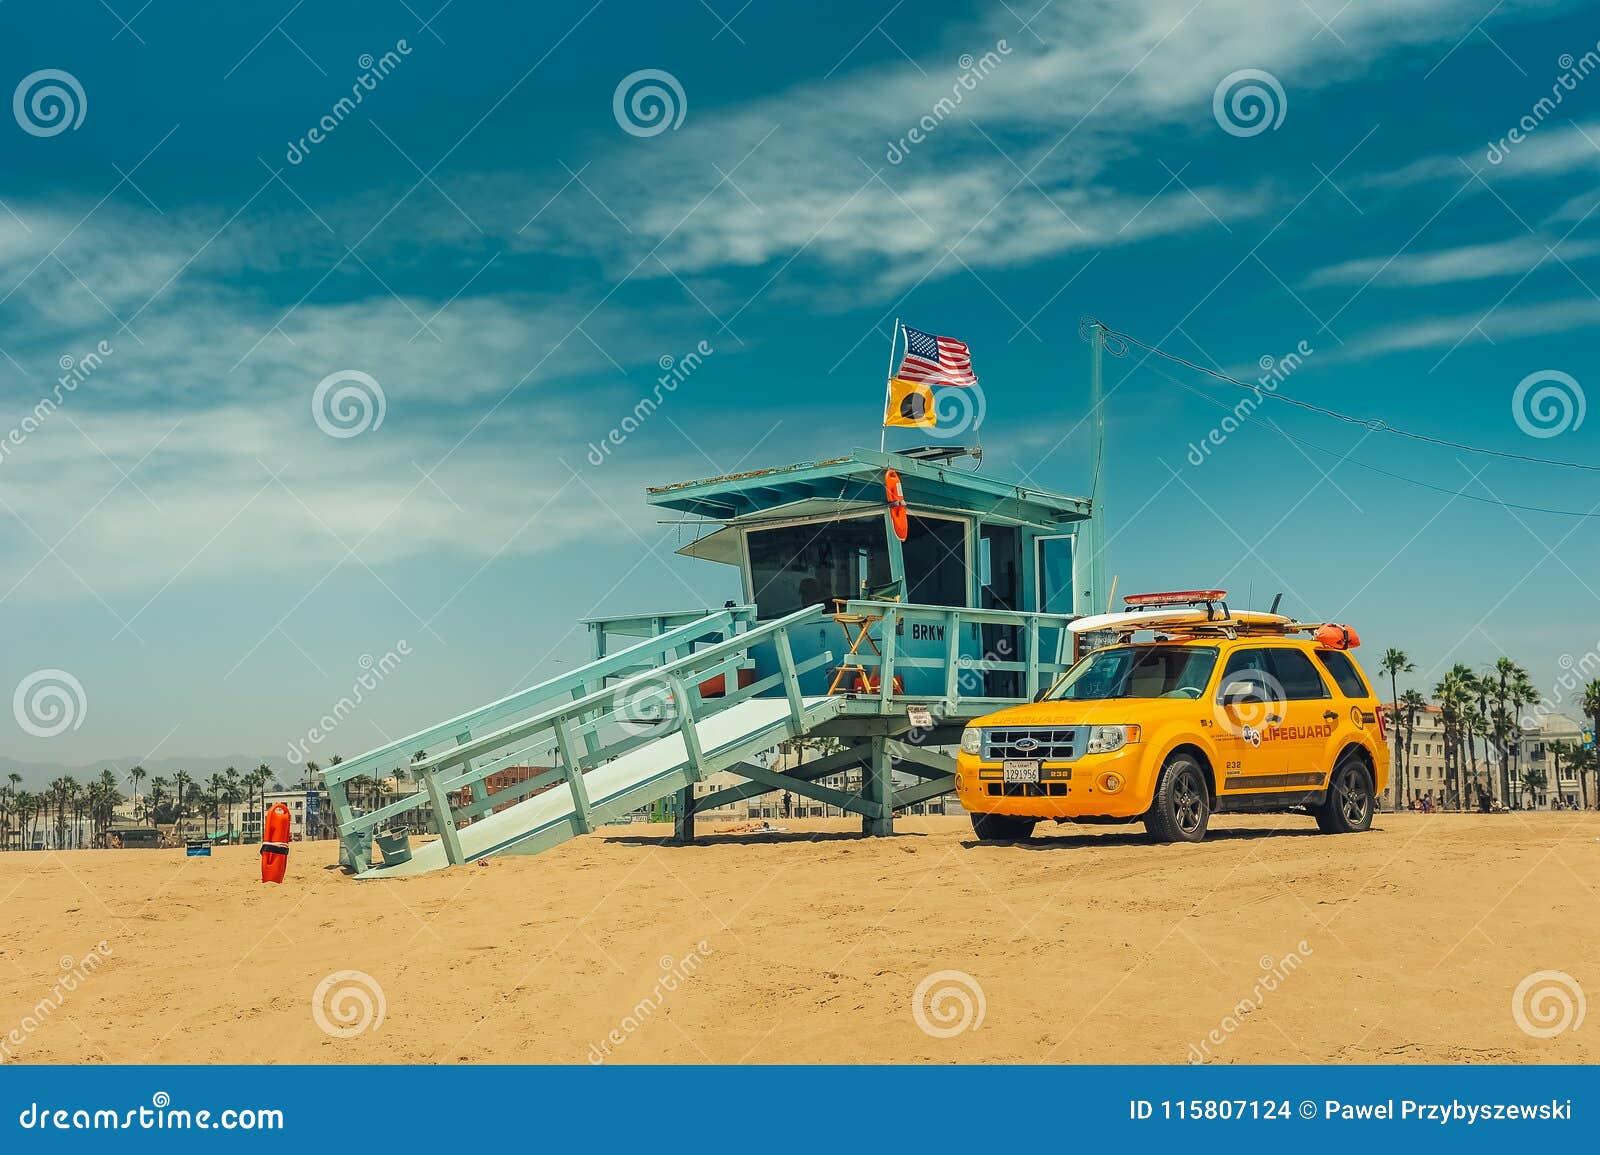 Los Angeles/California/USA - 07 22 2013: Leibwächterturm auf dem Strand mit gelbem Auto nahe bei ihm